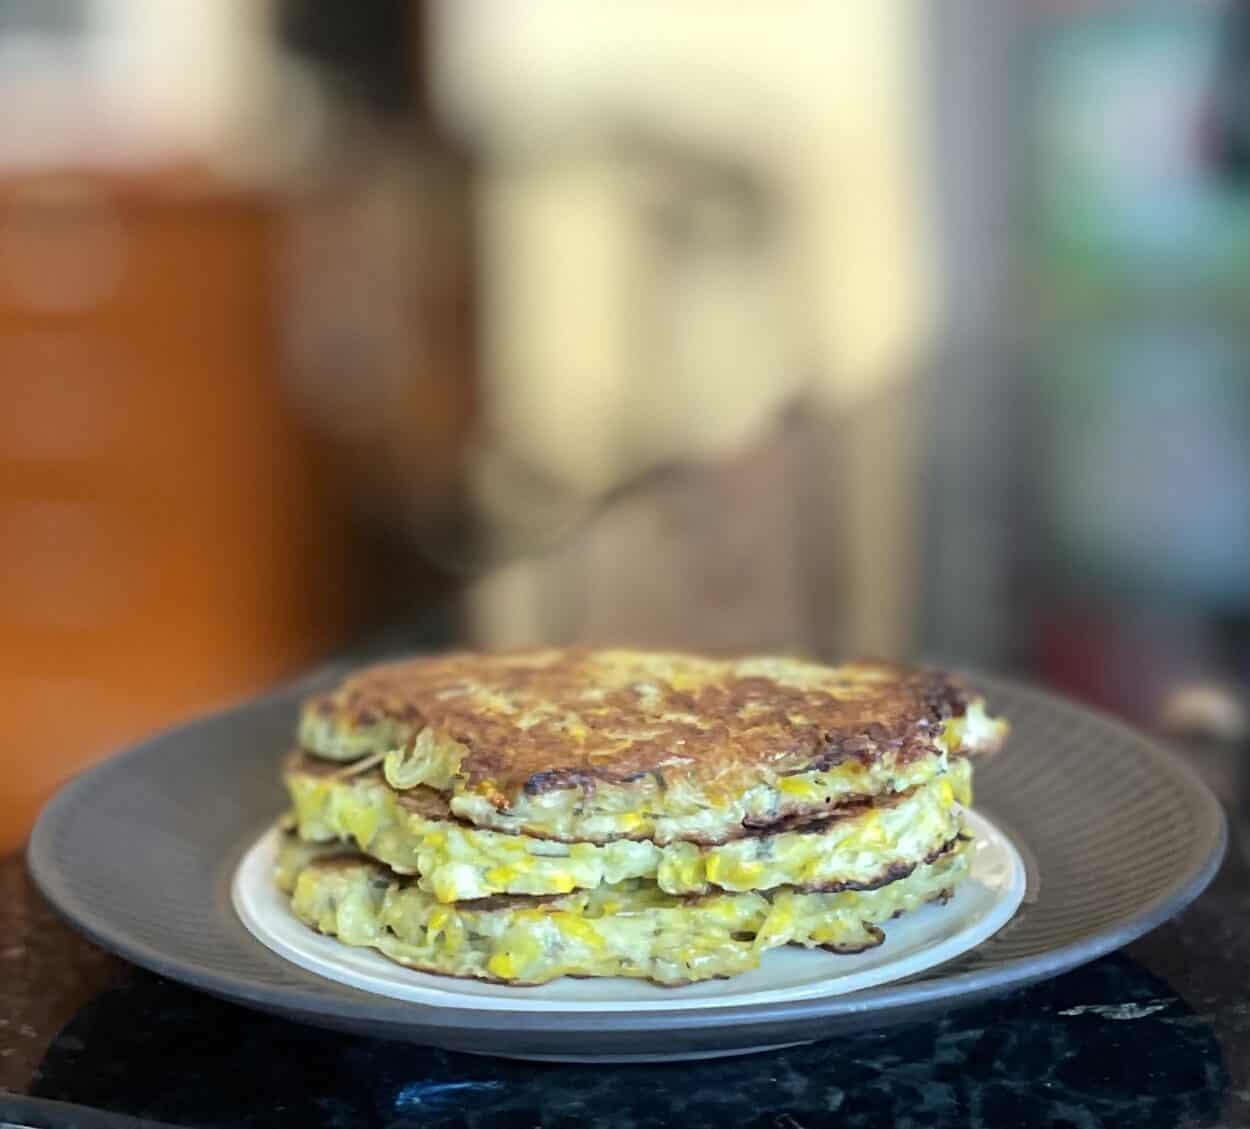 Fried Patty Pan Squash Patties